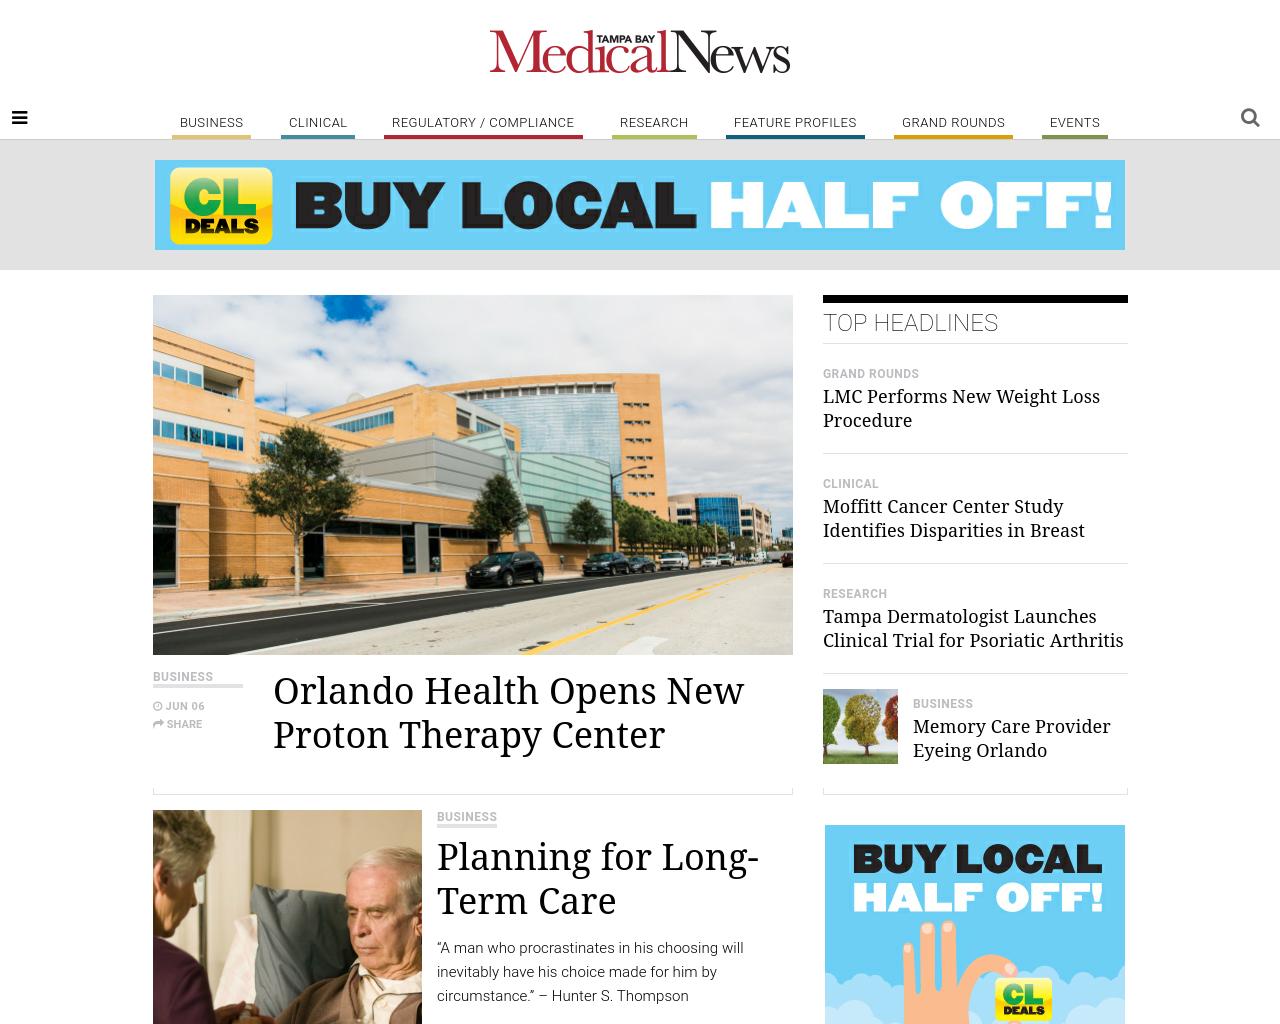 Tampa-Bay-Medical-News-Advertising-Reviews-Pricing